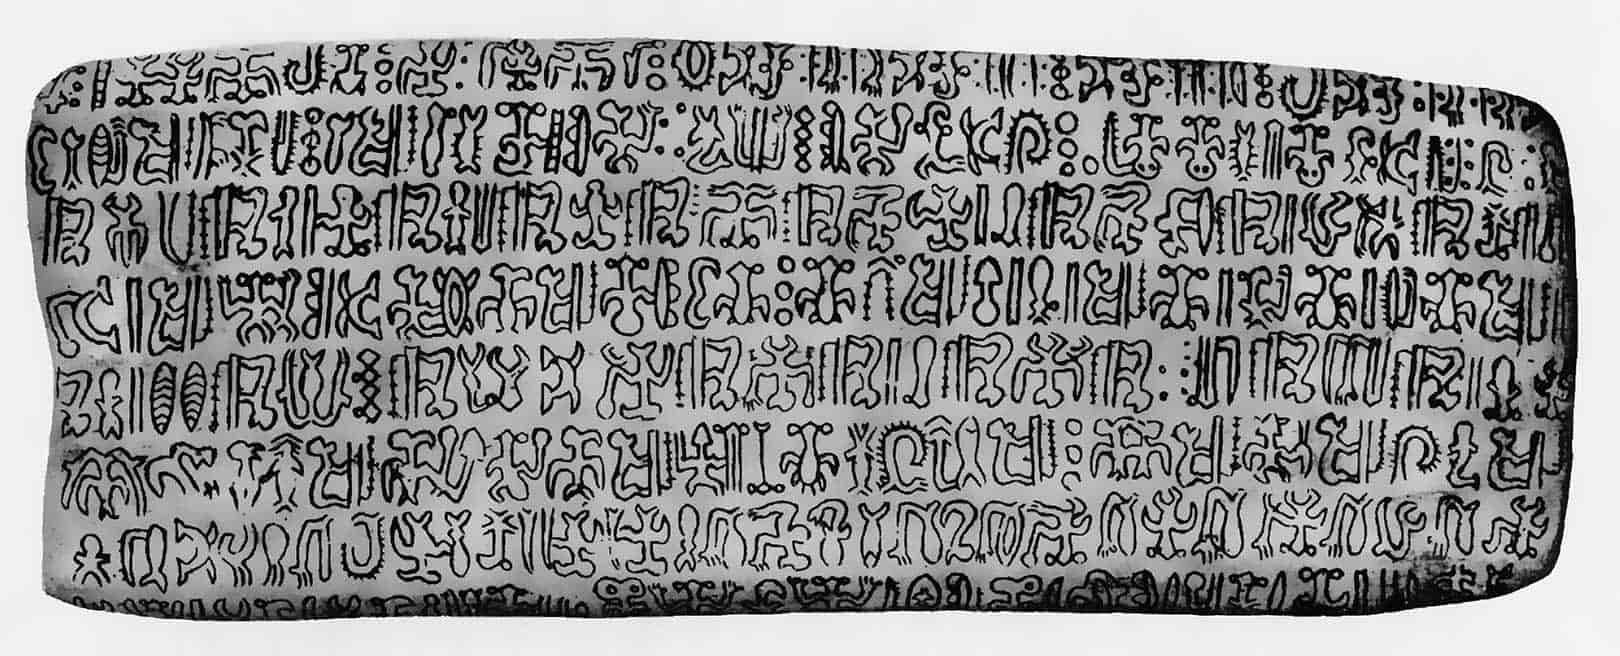 A picture of a Tohau rongorongo writing board (source: //boloji.com)